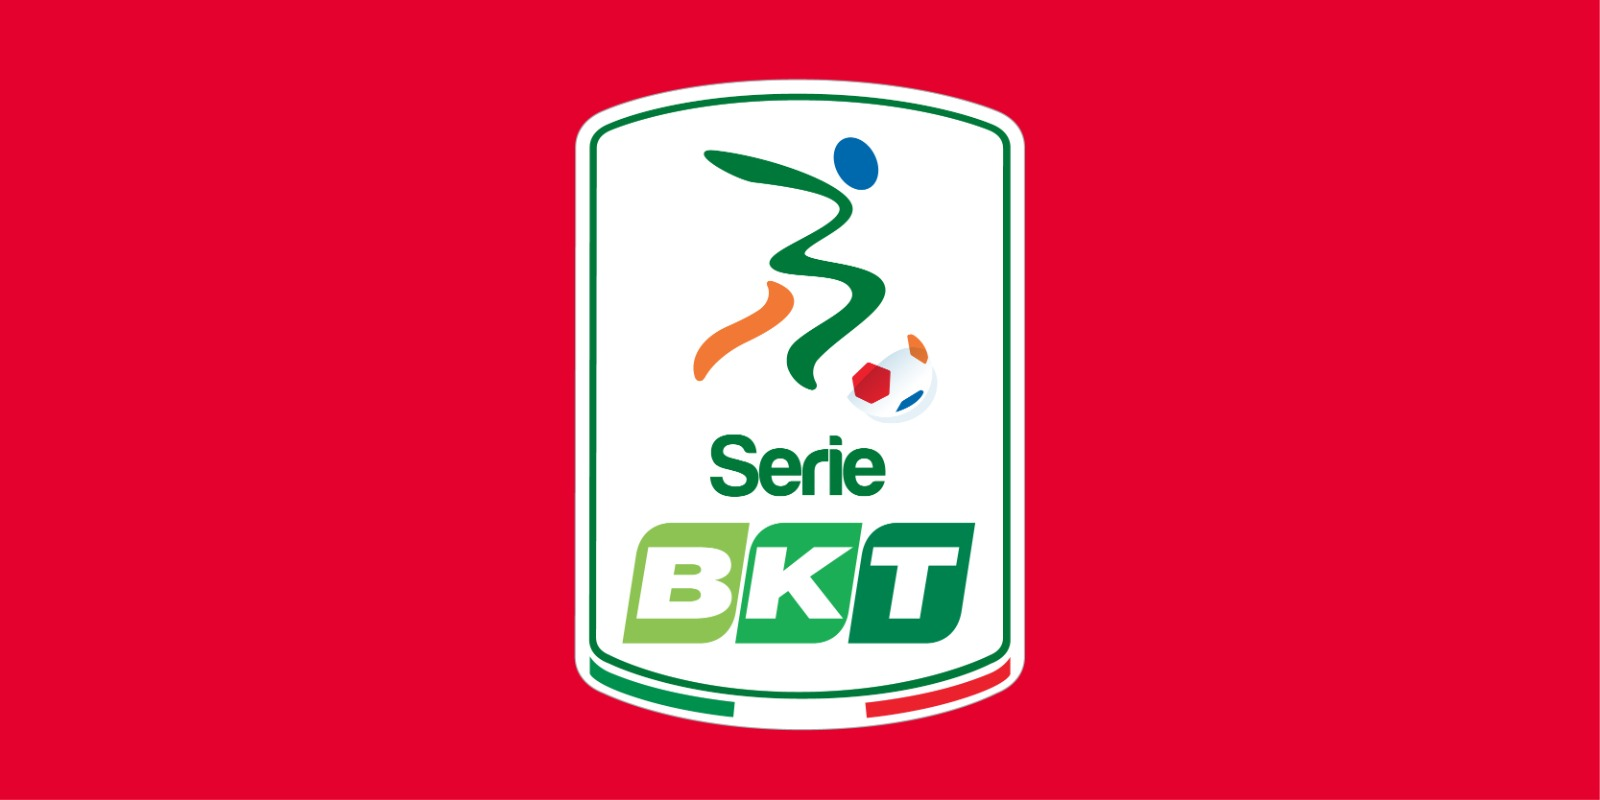 Serie BKT 2021-22 anche in Austria, Germania e Svizzera